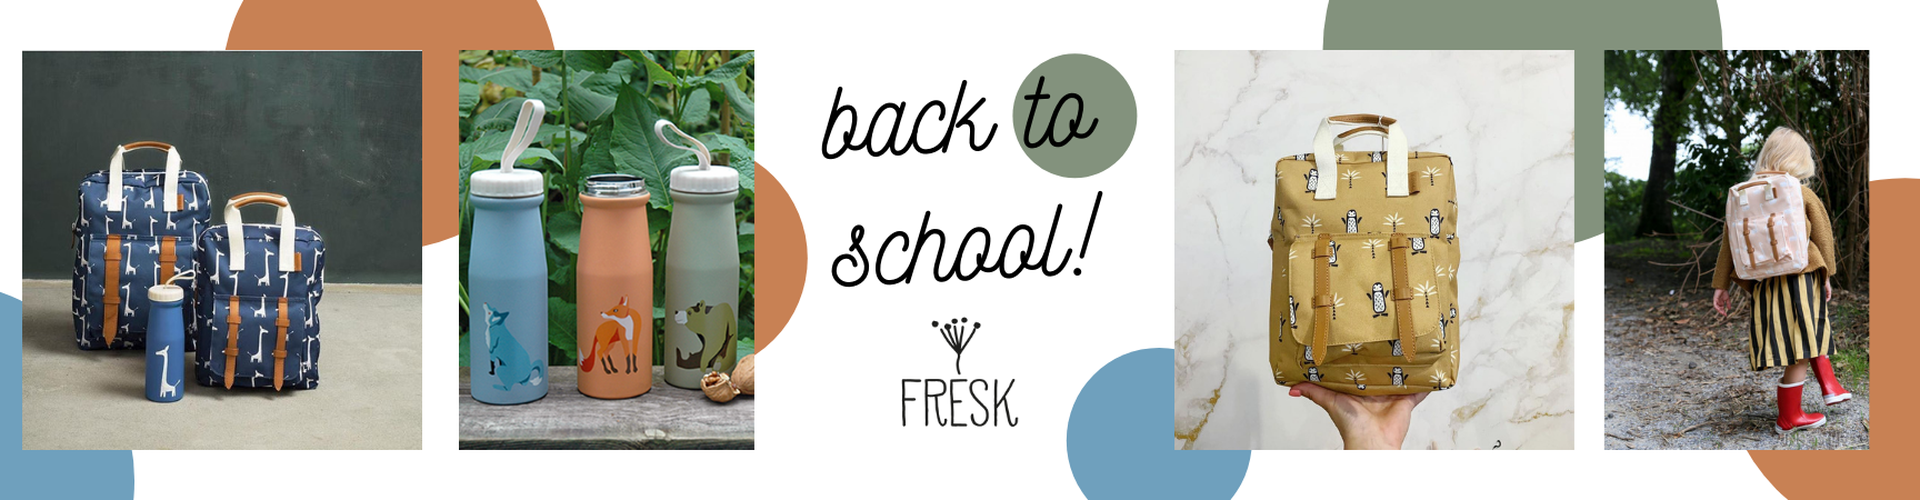 Fresk back to school